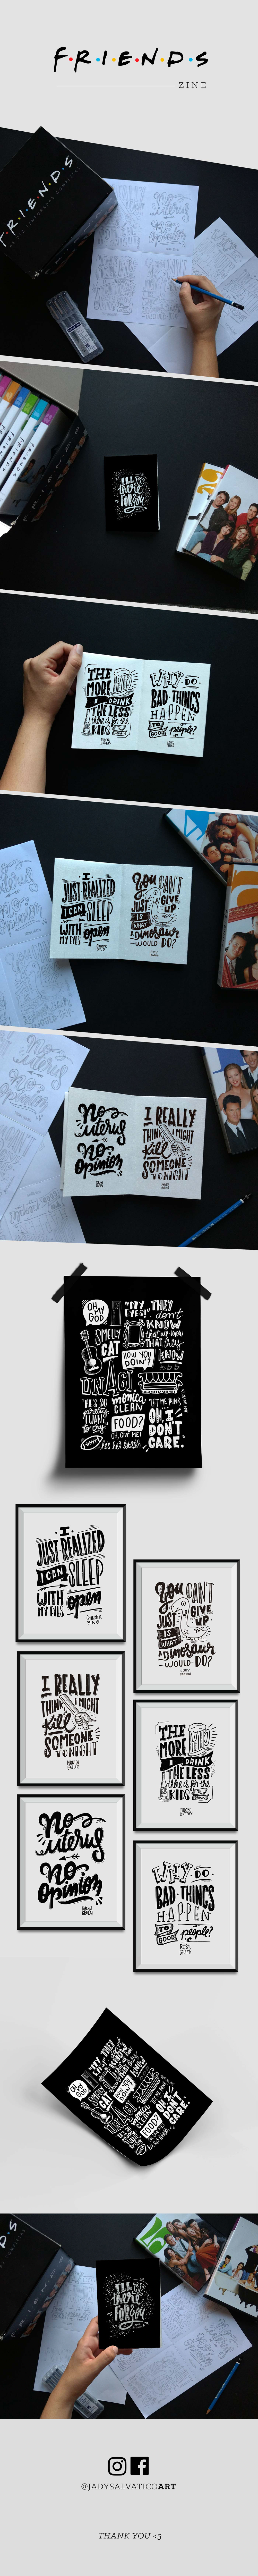 Zine  friends Serie handmade lettering type editorial graphic design  Fan Art